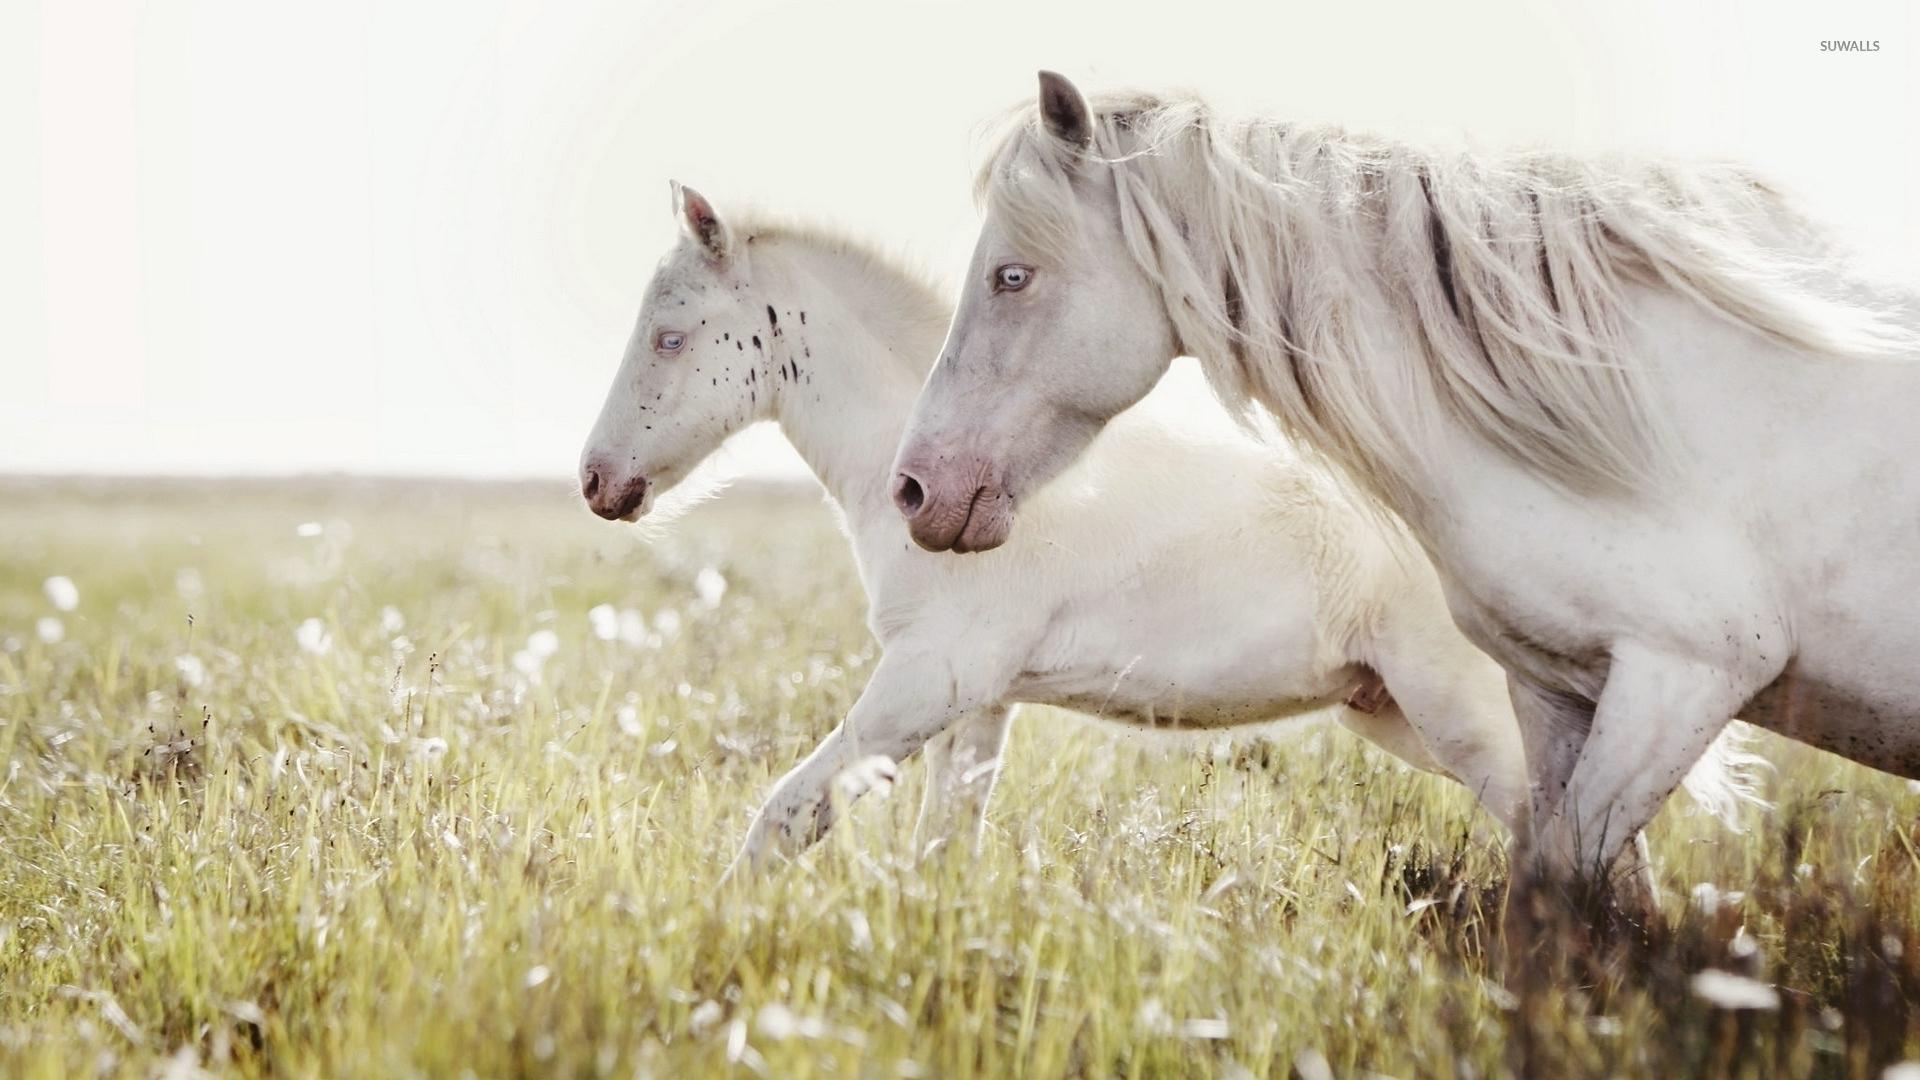 Animal Print Desktop Wallpaper Two White Horses Running On The Meadow Wallpaper Animal